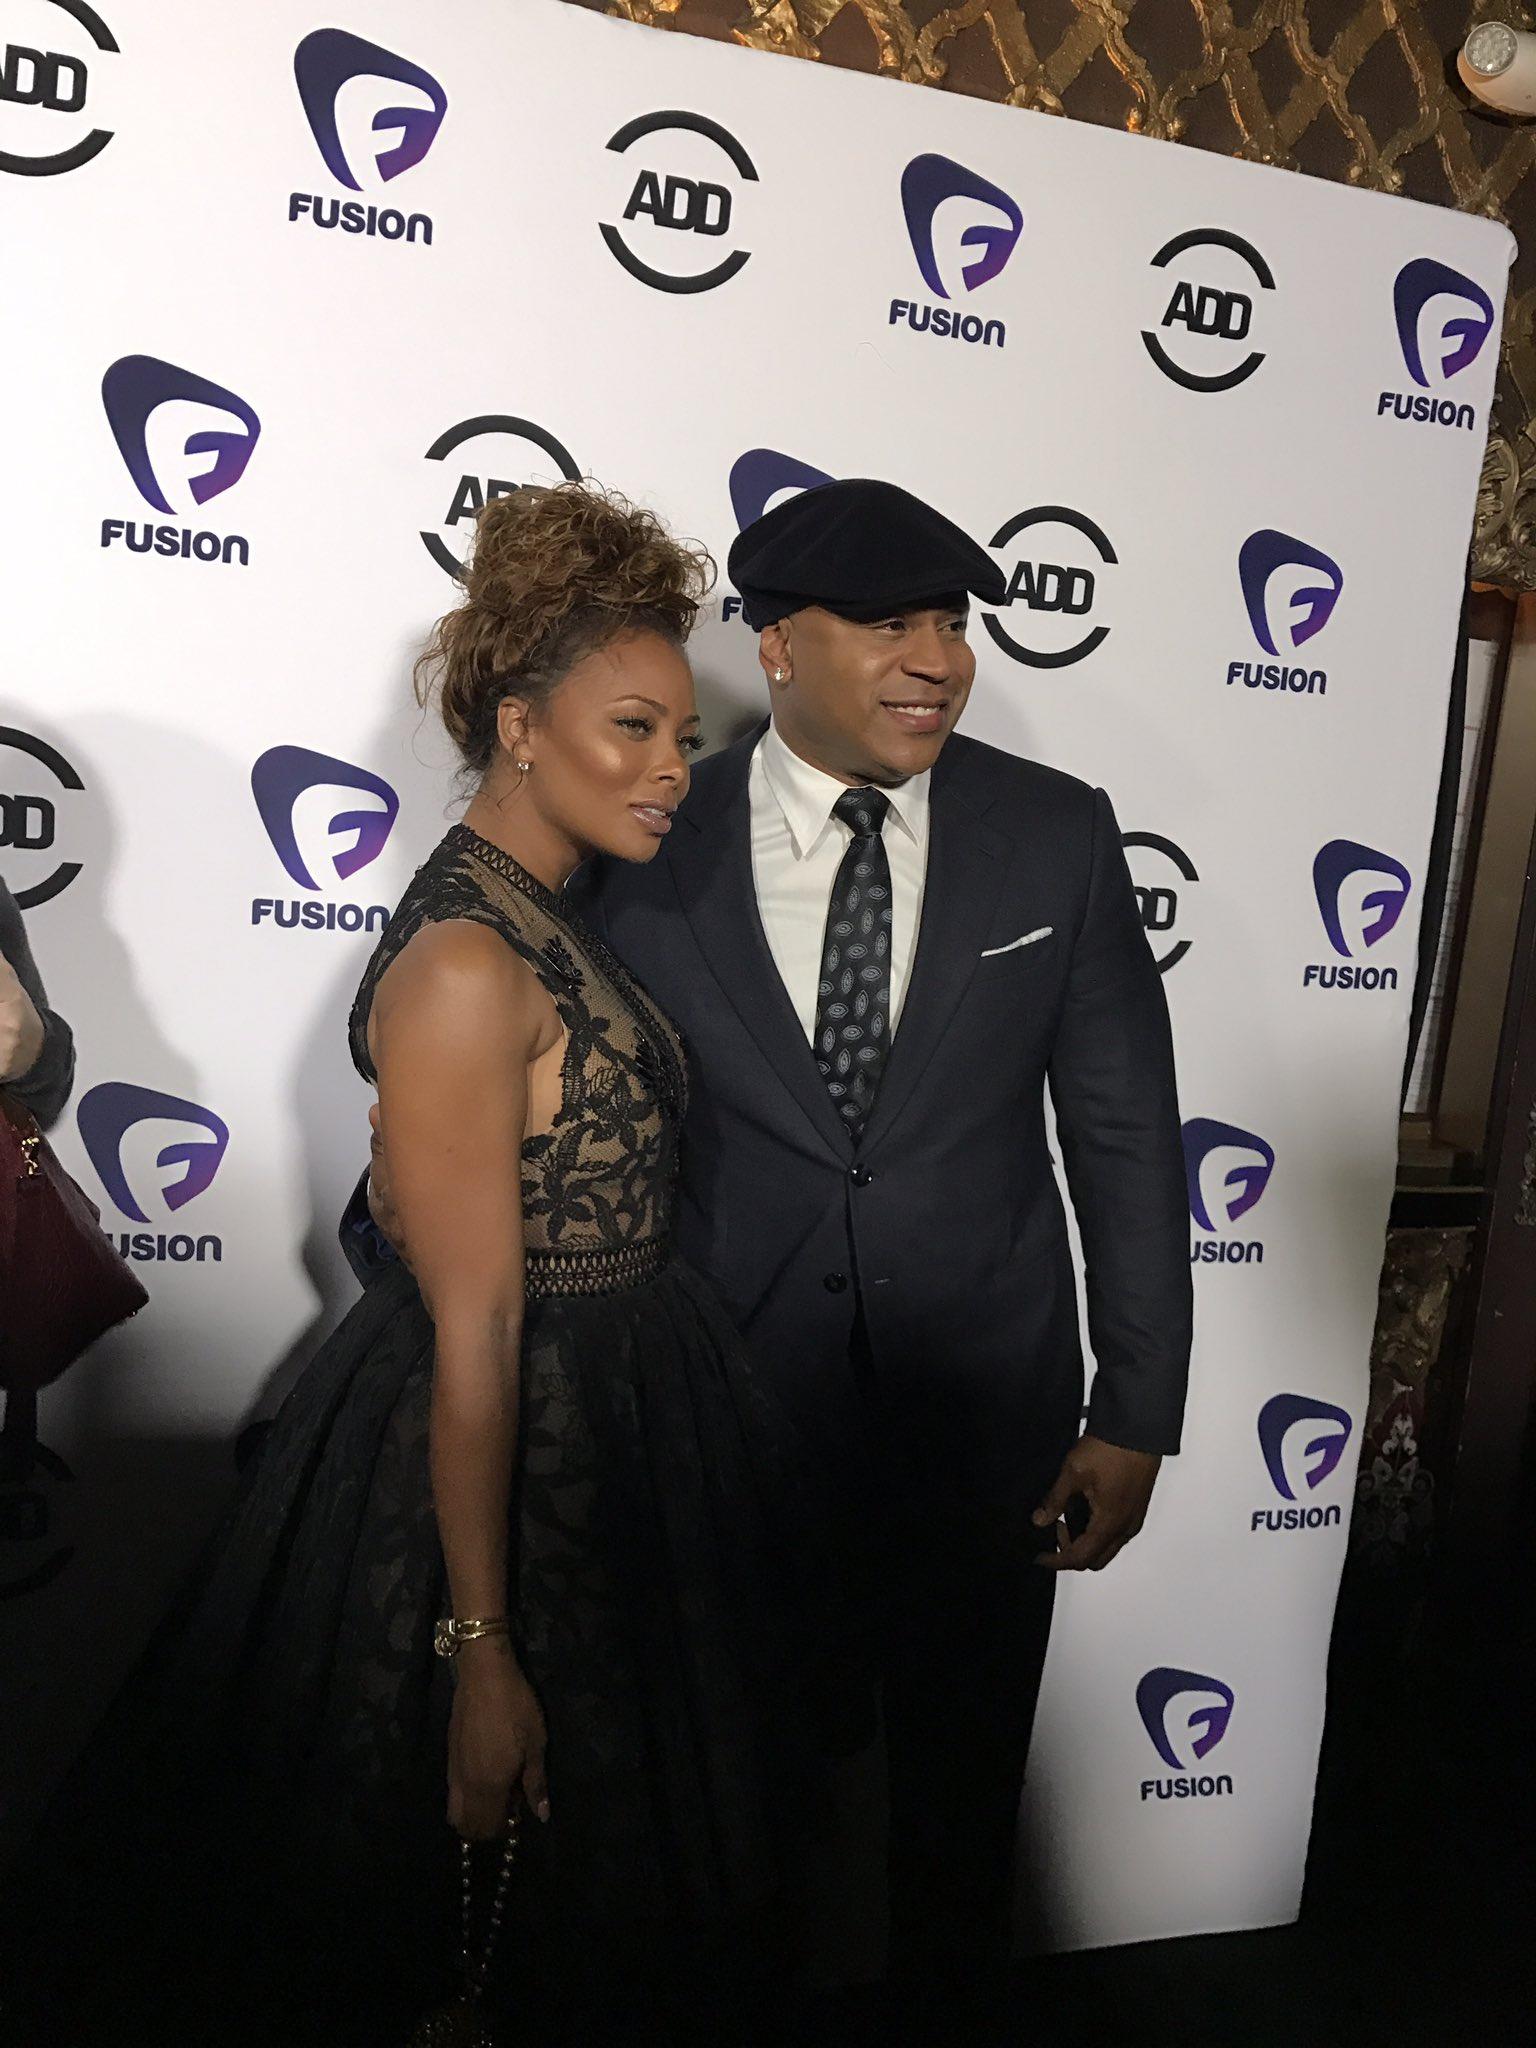 RT @HipHopDX: .@llcoolj & @EvaMarcille taking the black carpet at the @AllDefDigital Movie Awards 🔥 #ADMA https://t.co/fsnpm6Bi1b